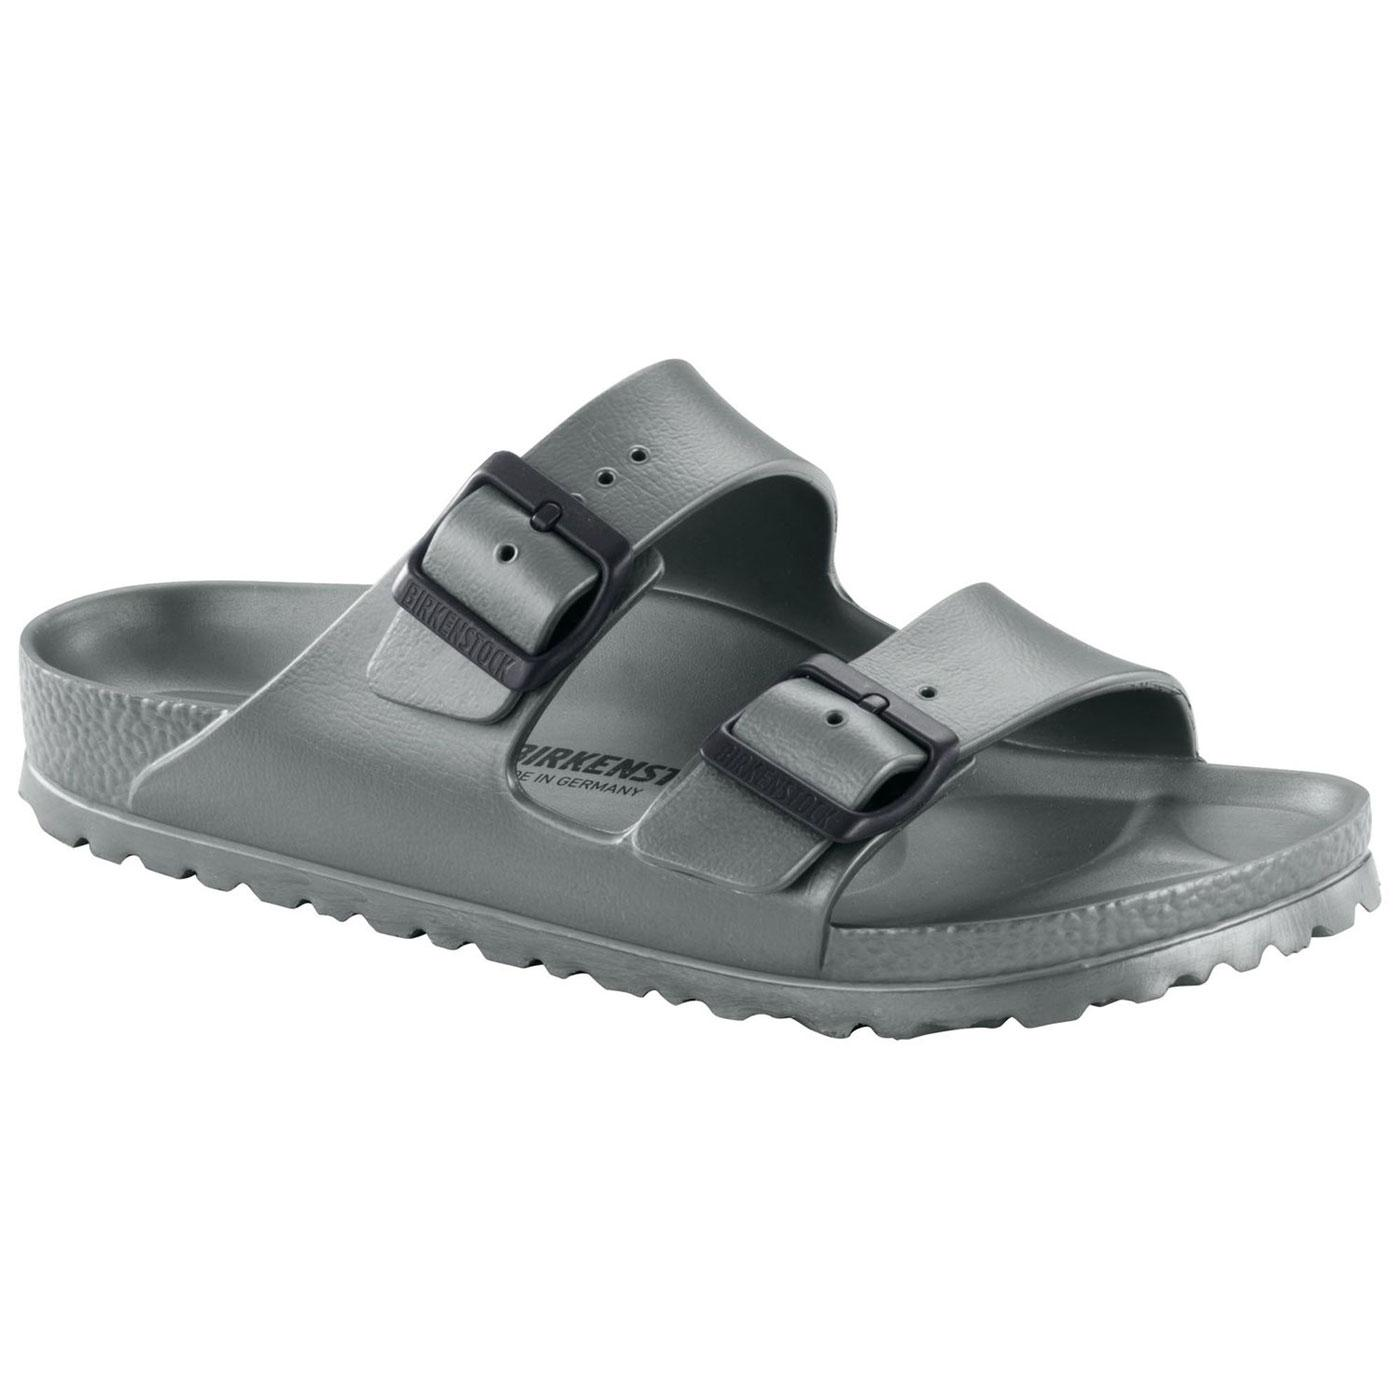 ea477e72ffeb BIRKENSTOCK Arizona EVA Waterproof Sandals in Seal Grey